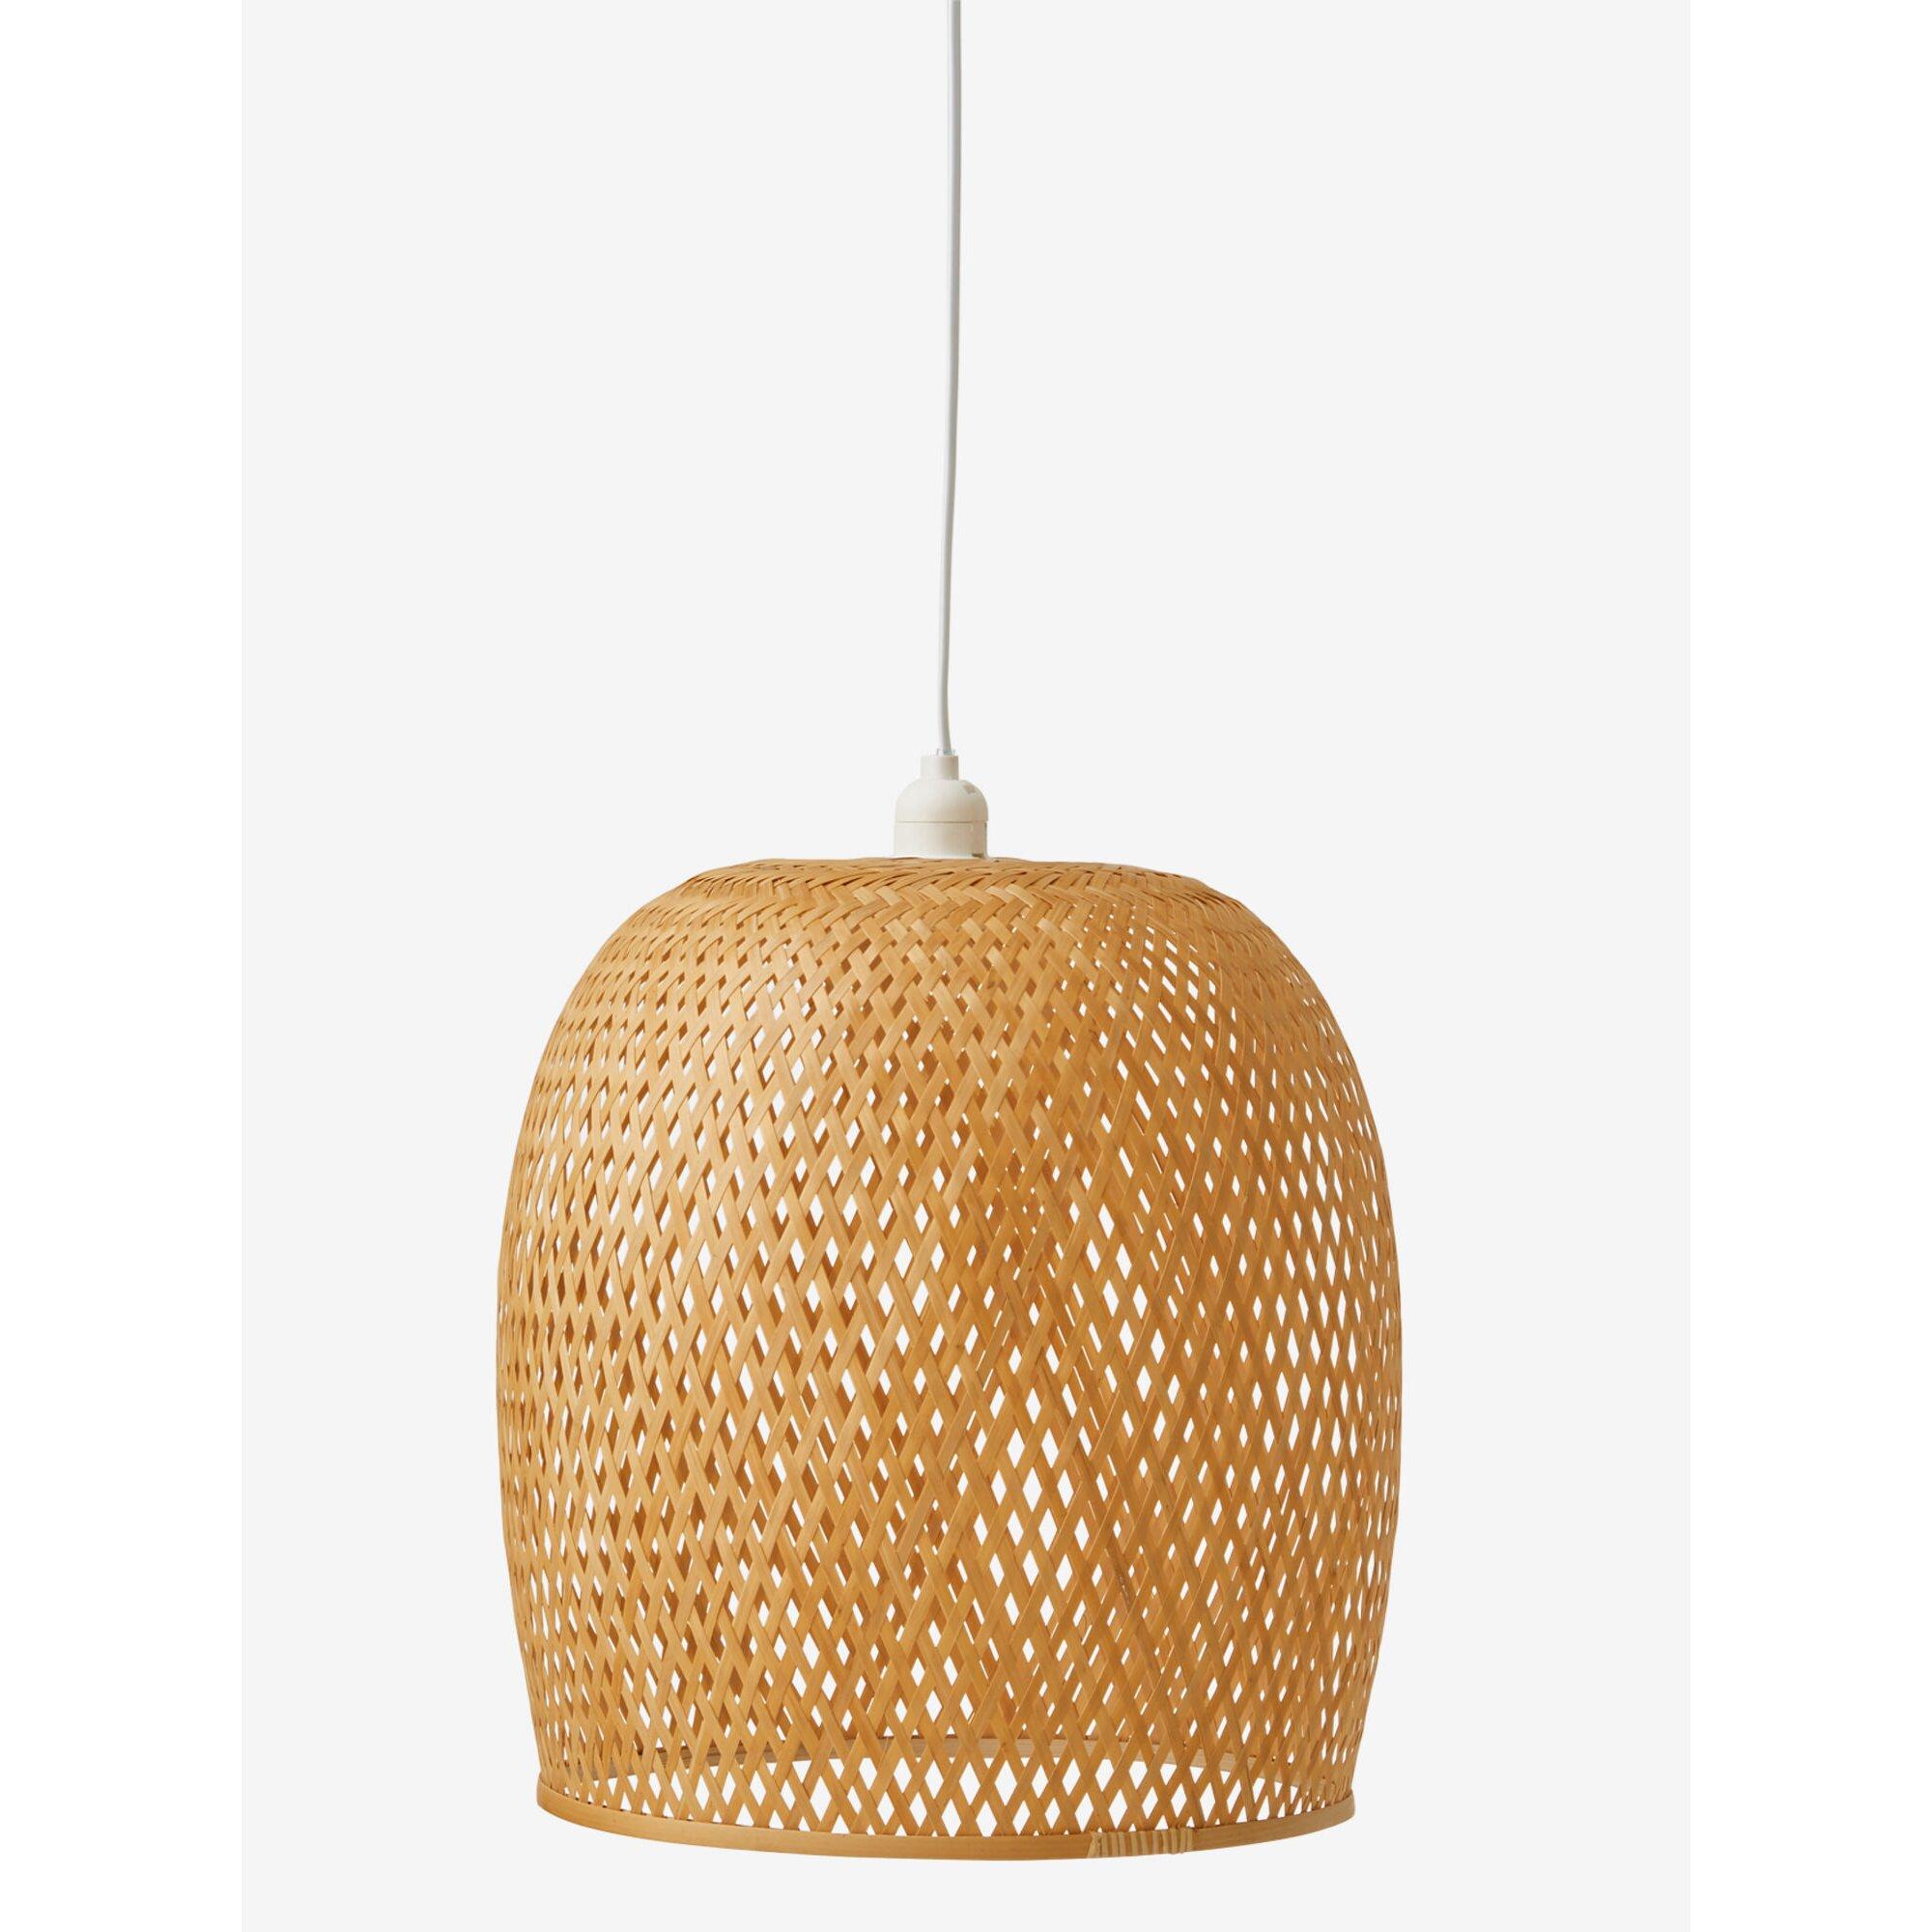 Vertbaudet Lampenschirm aus Bambusgeflecht, Glockenform